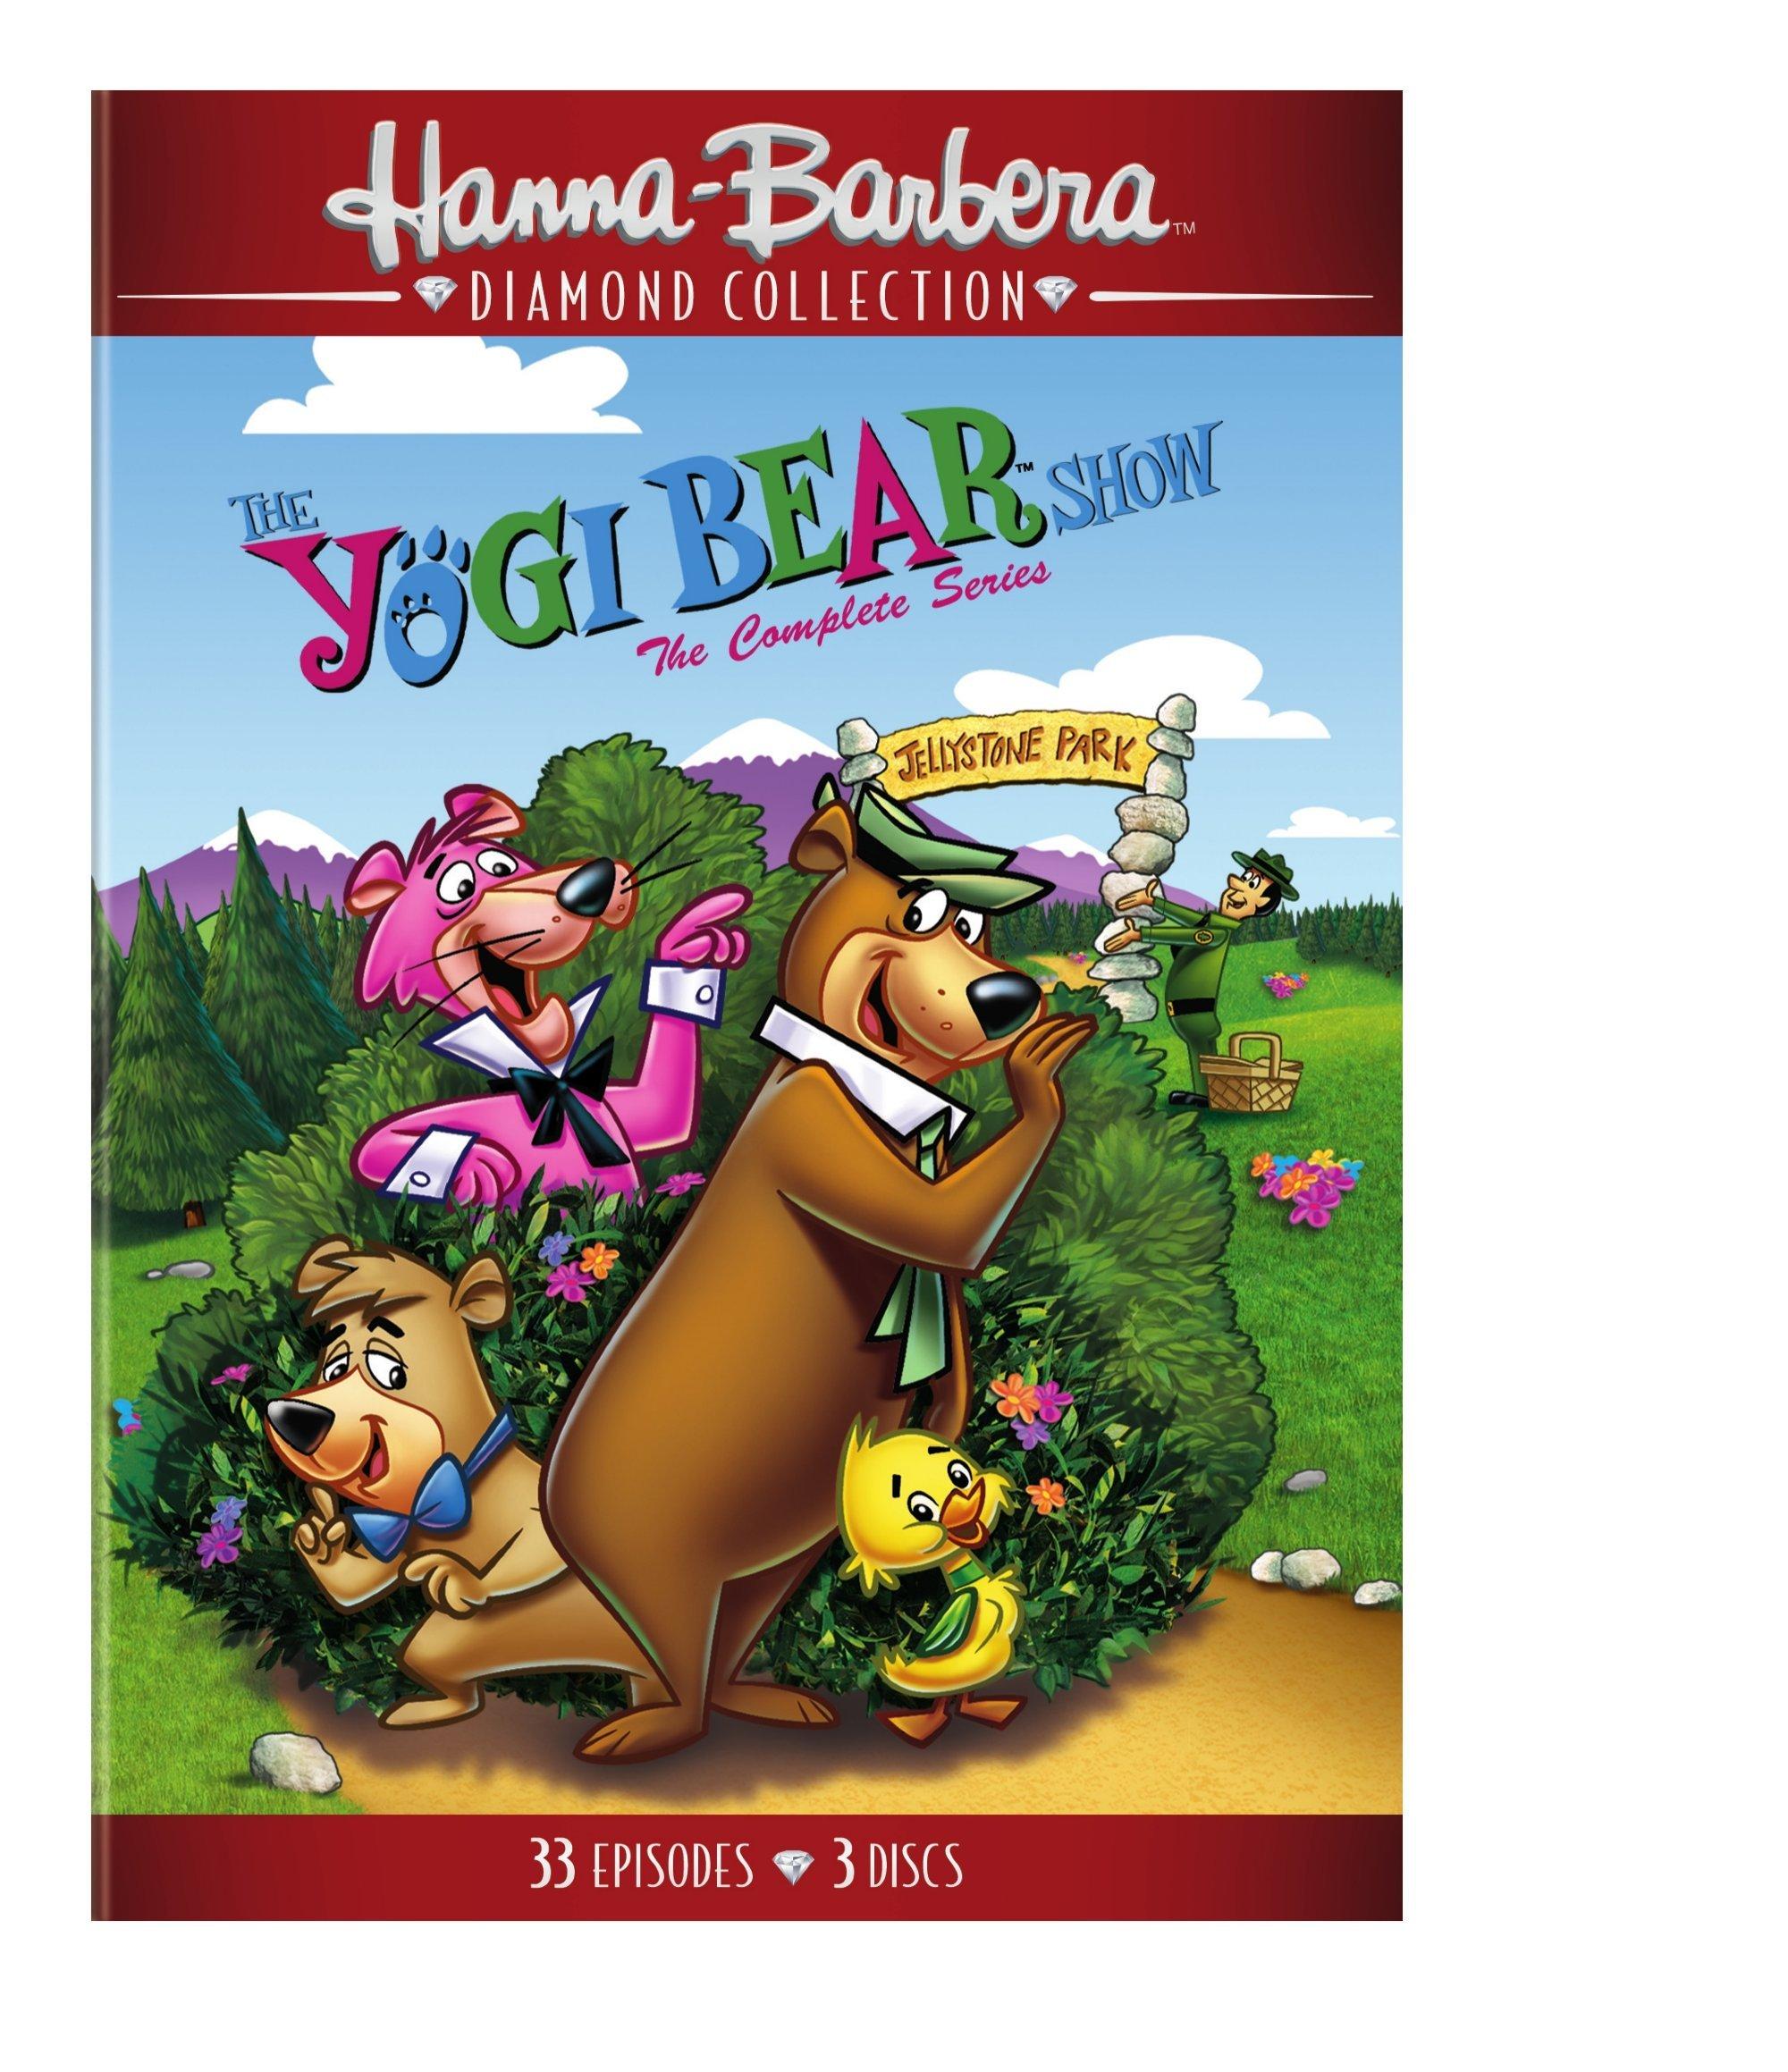 Yogi Bear Show, The: The Complete Series